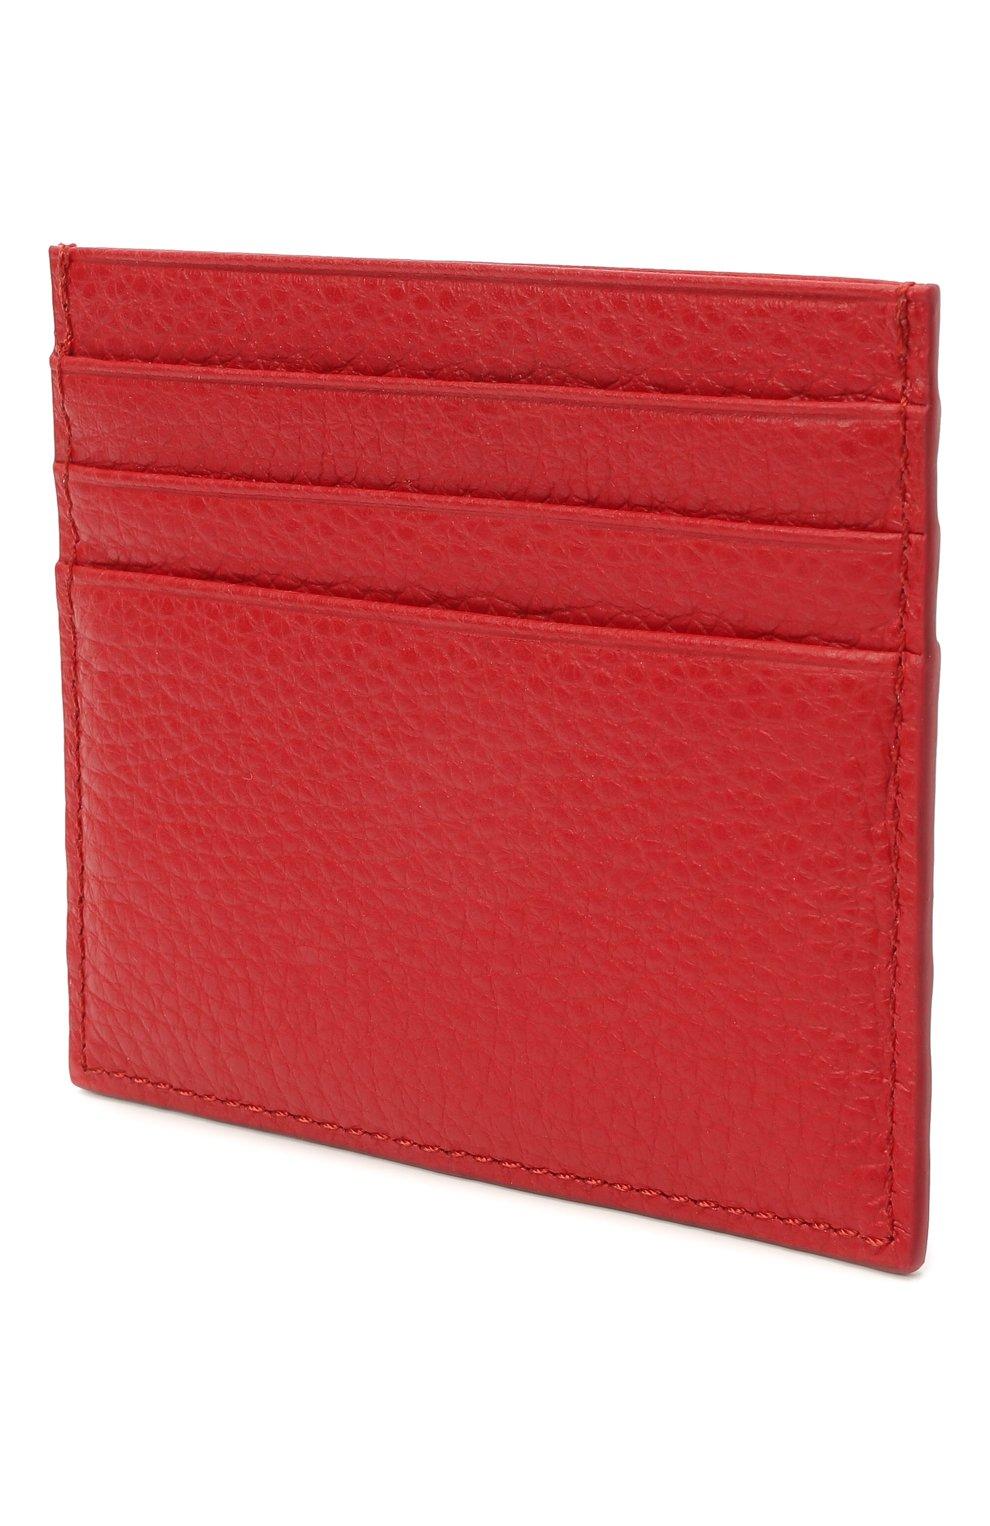 Женский кожаный футляр для кредитных карт COCCINELLE красного цвета, арт. E2 HW5 12 95 01   Фото 2